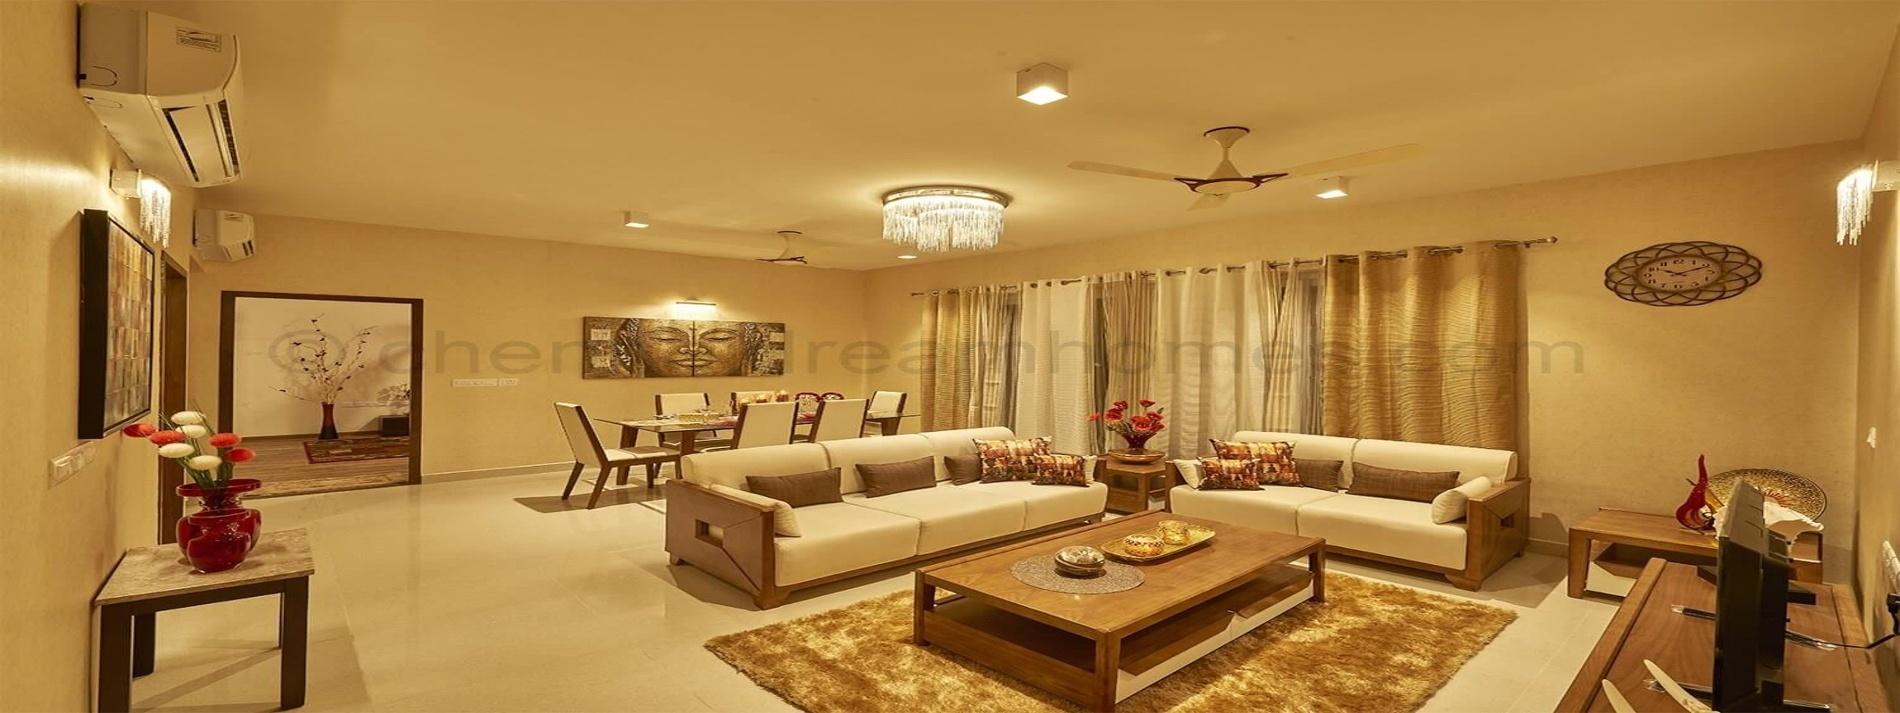 2.5 and 3 BHK Premium Apartments in Adyar